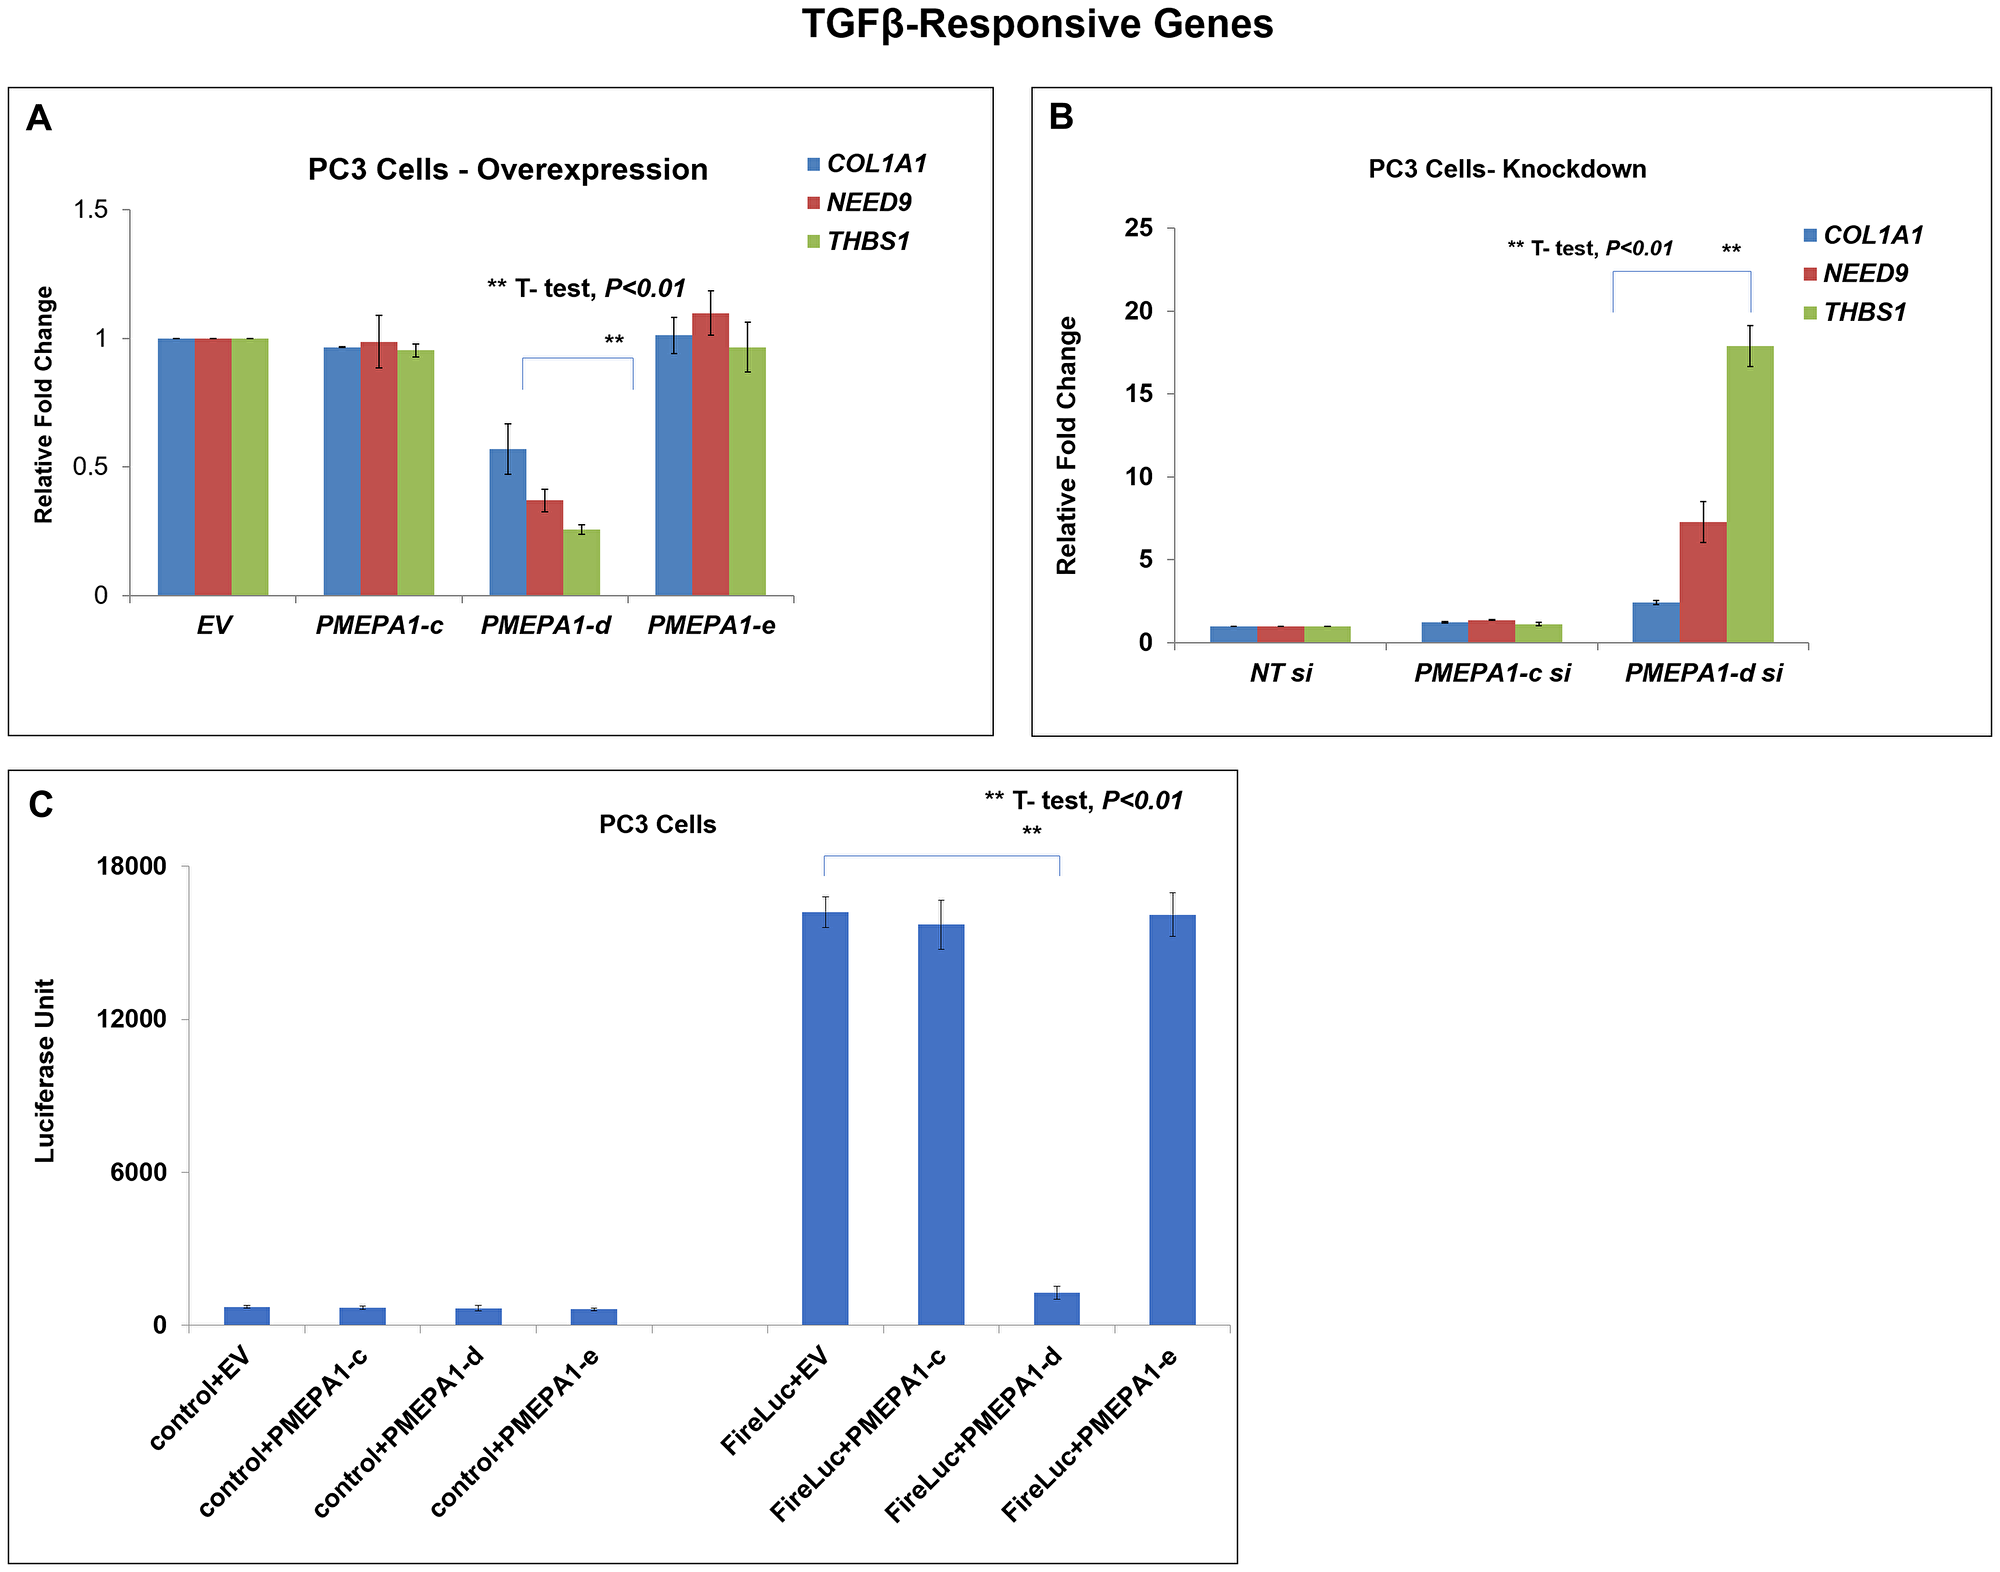 PMEPA1-d isoform inhibited TGF-β signaling in PC3 cells.